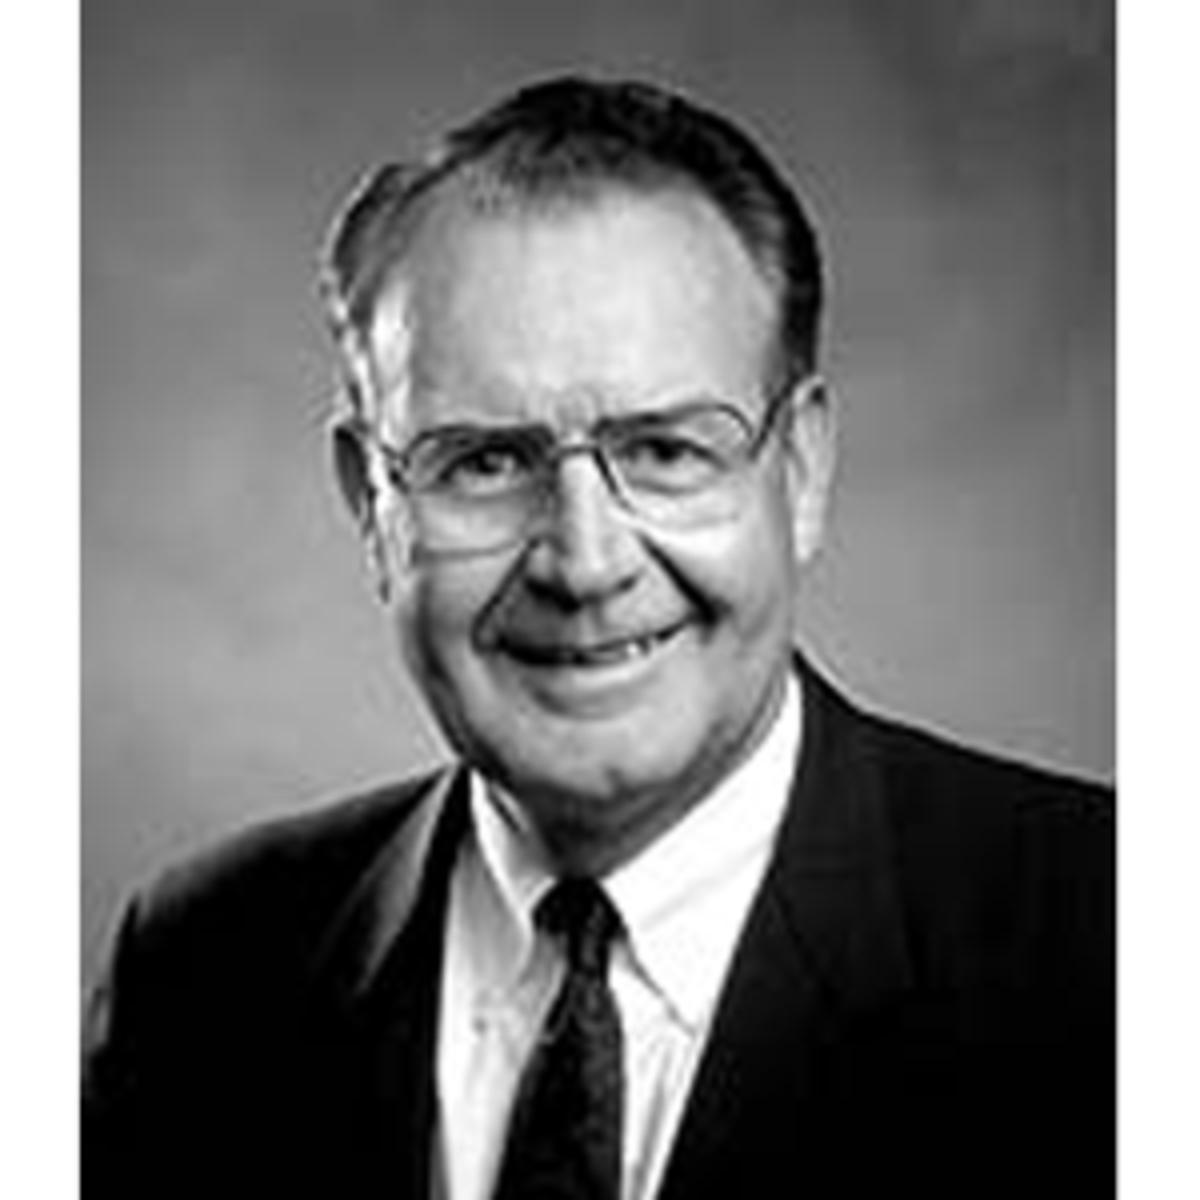 David E. Sorensen